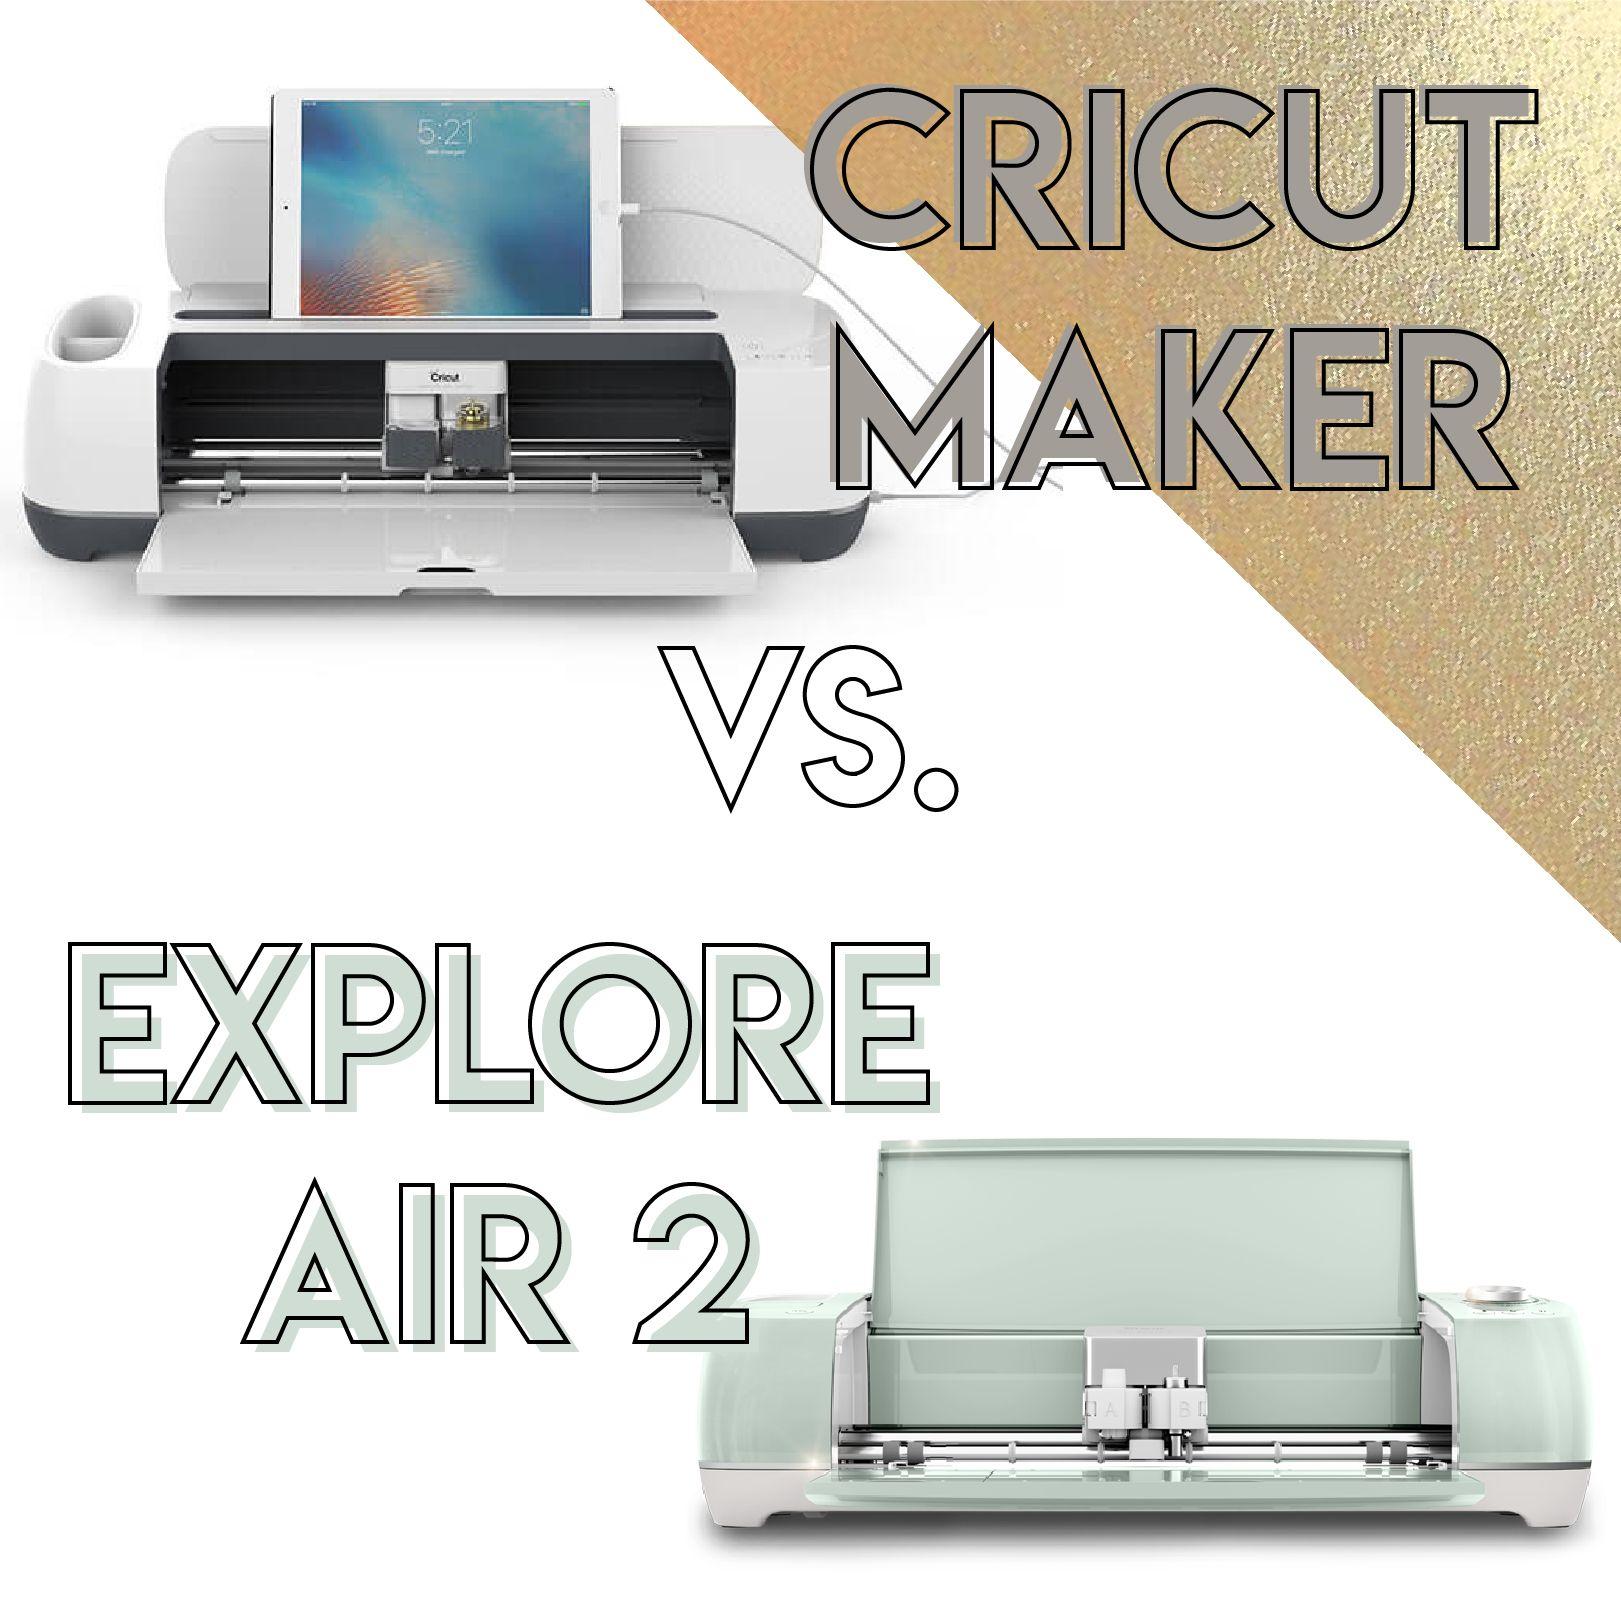 Cricut Explore Air 2 vs. Cricut Maker Comparison Read